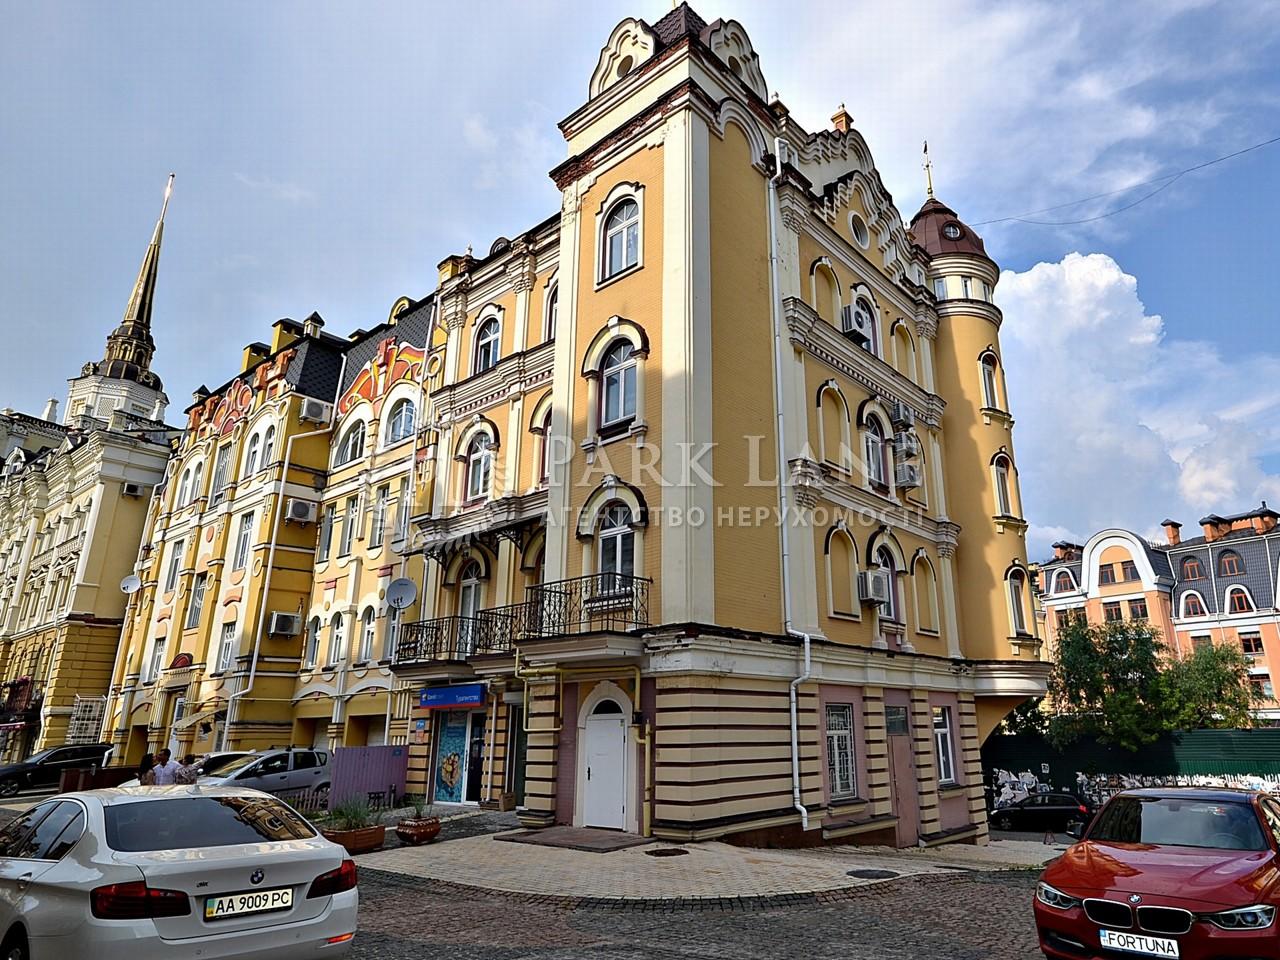 Квартира ул. Кожемяцкая, 20б, Киев, J-29622 - Фото 1